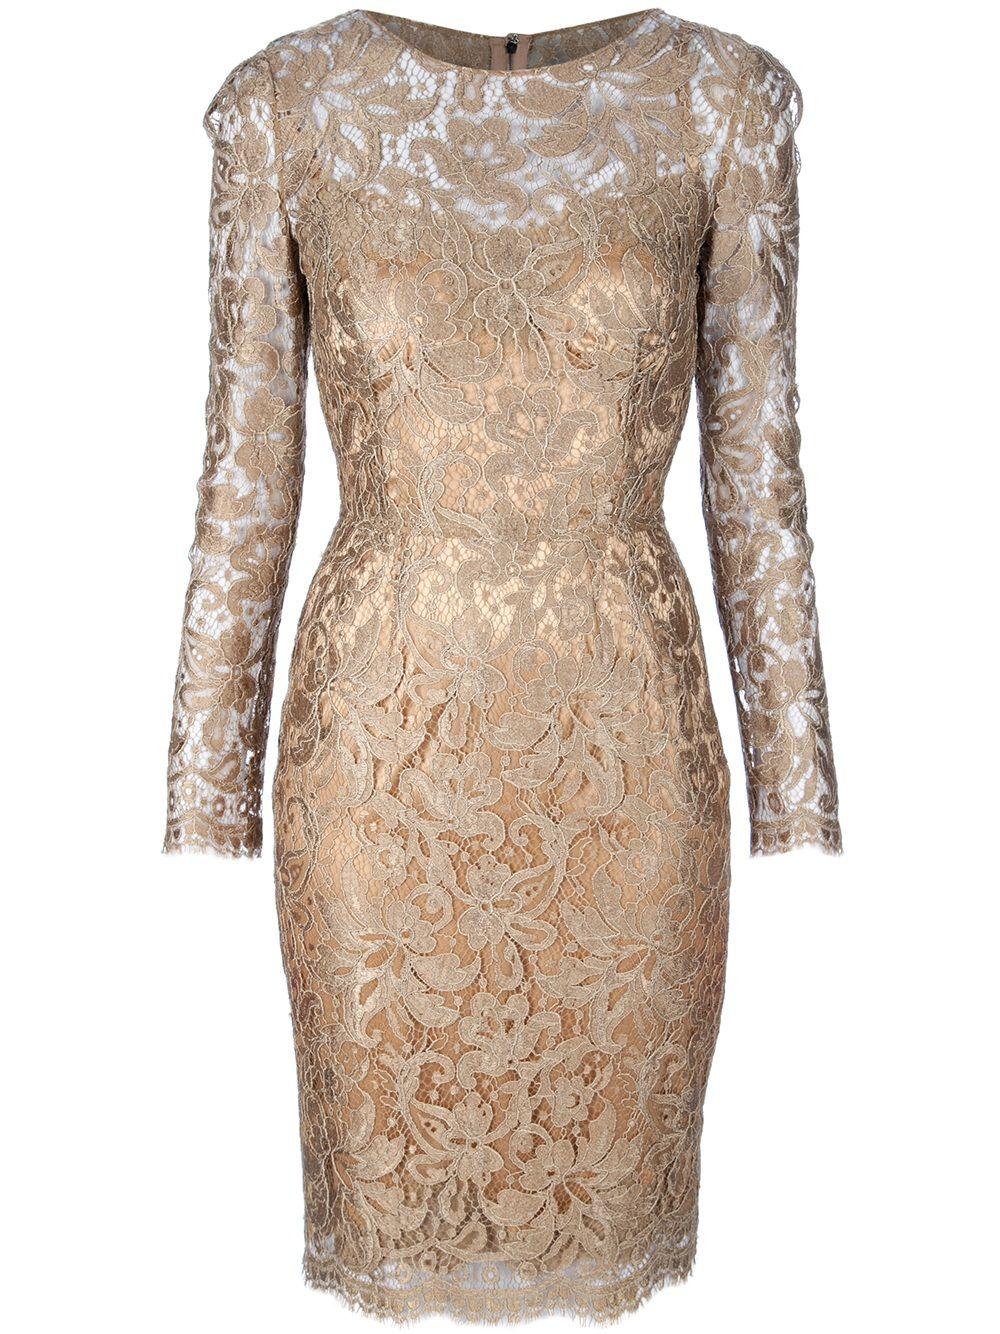 1a0e8c2ac05 DOLCE   GABBANA - Lace Dress